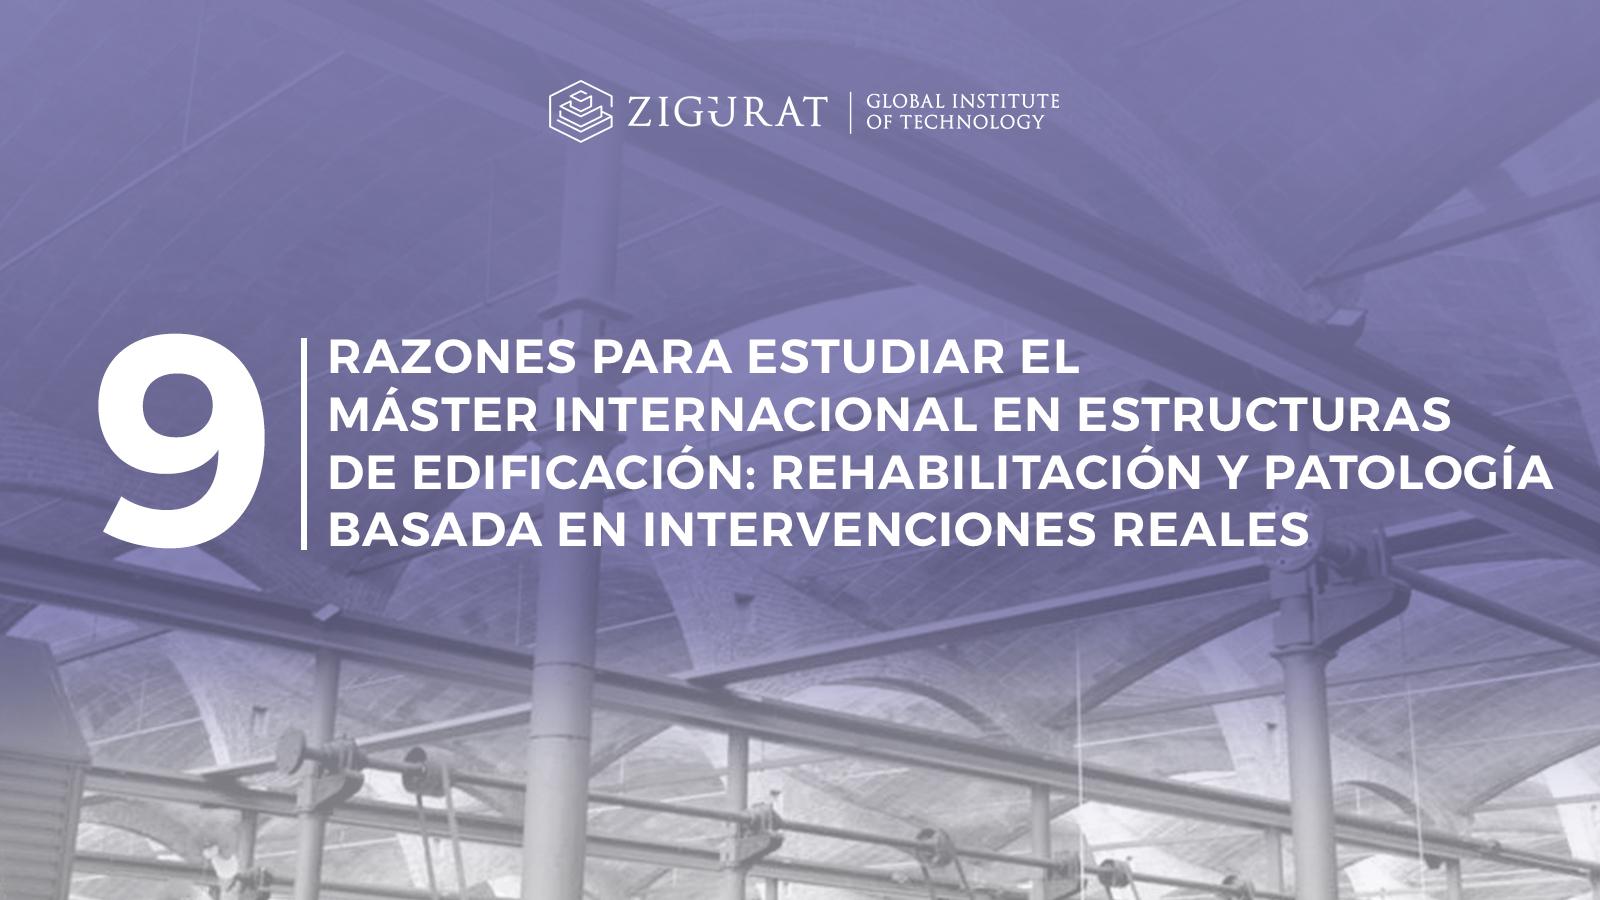 estructuras-rehabilitacion-master-online-zigurat-02